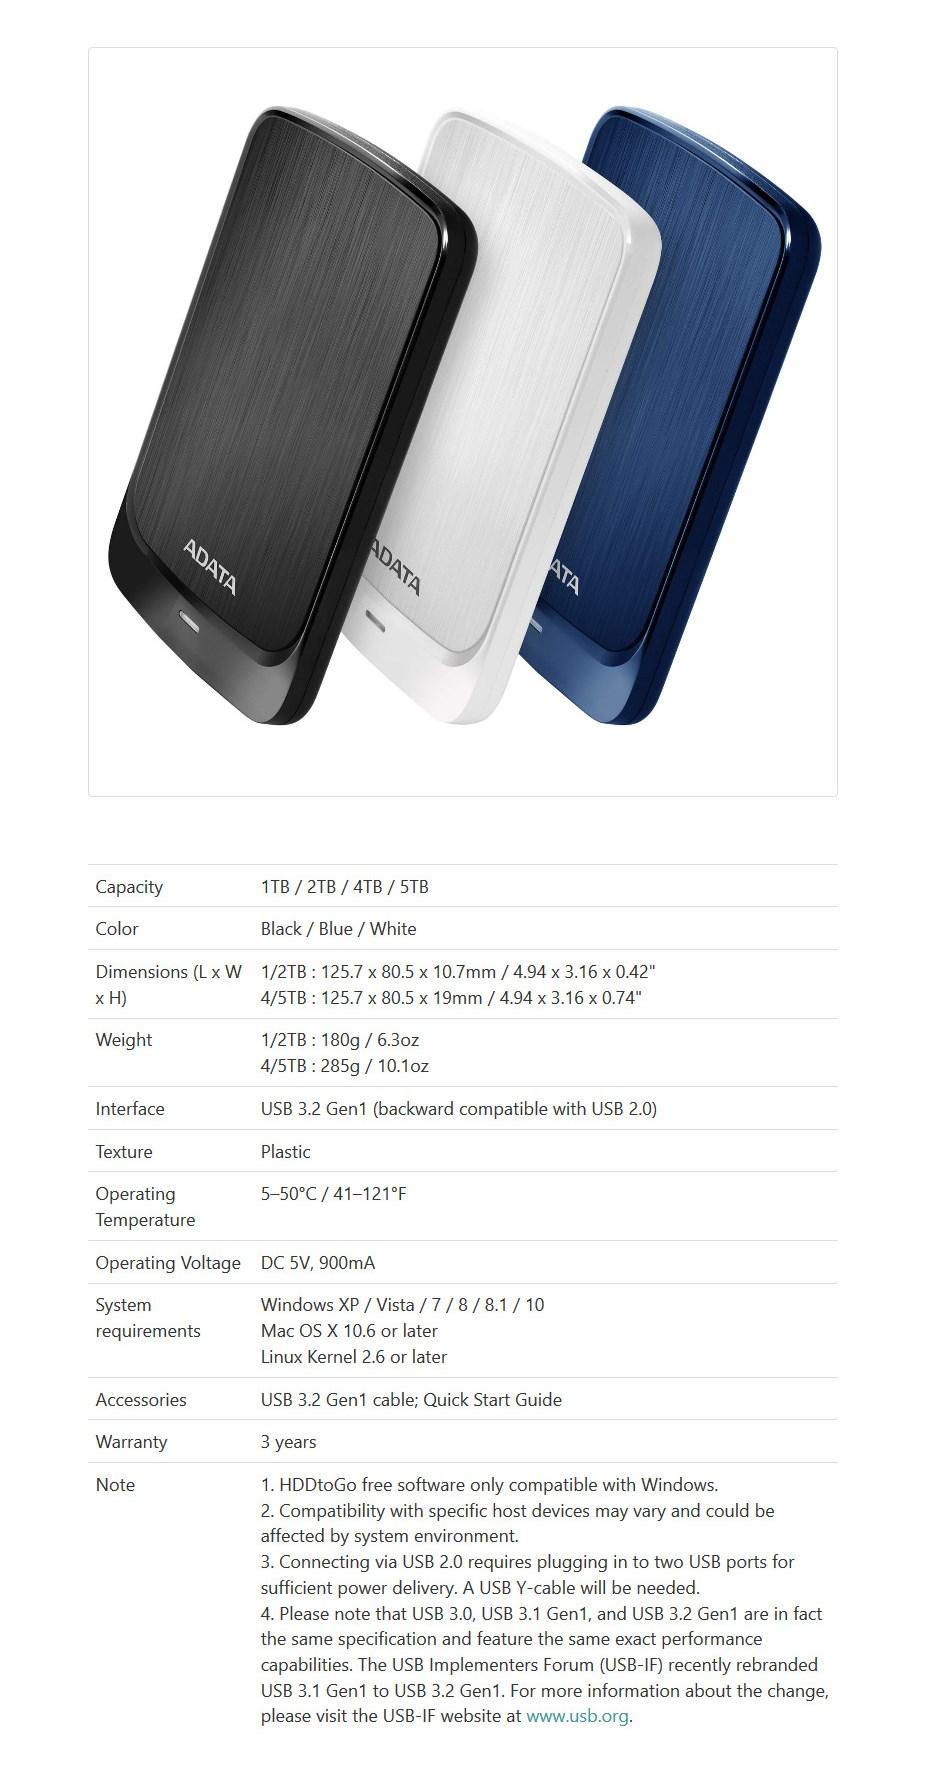 adata-fv320-1tb-usb-30-slim-portable-external-hard-drive-black-ac31652-9.jpg